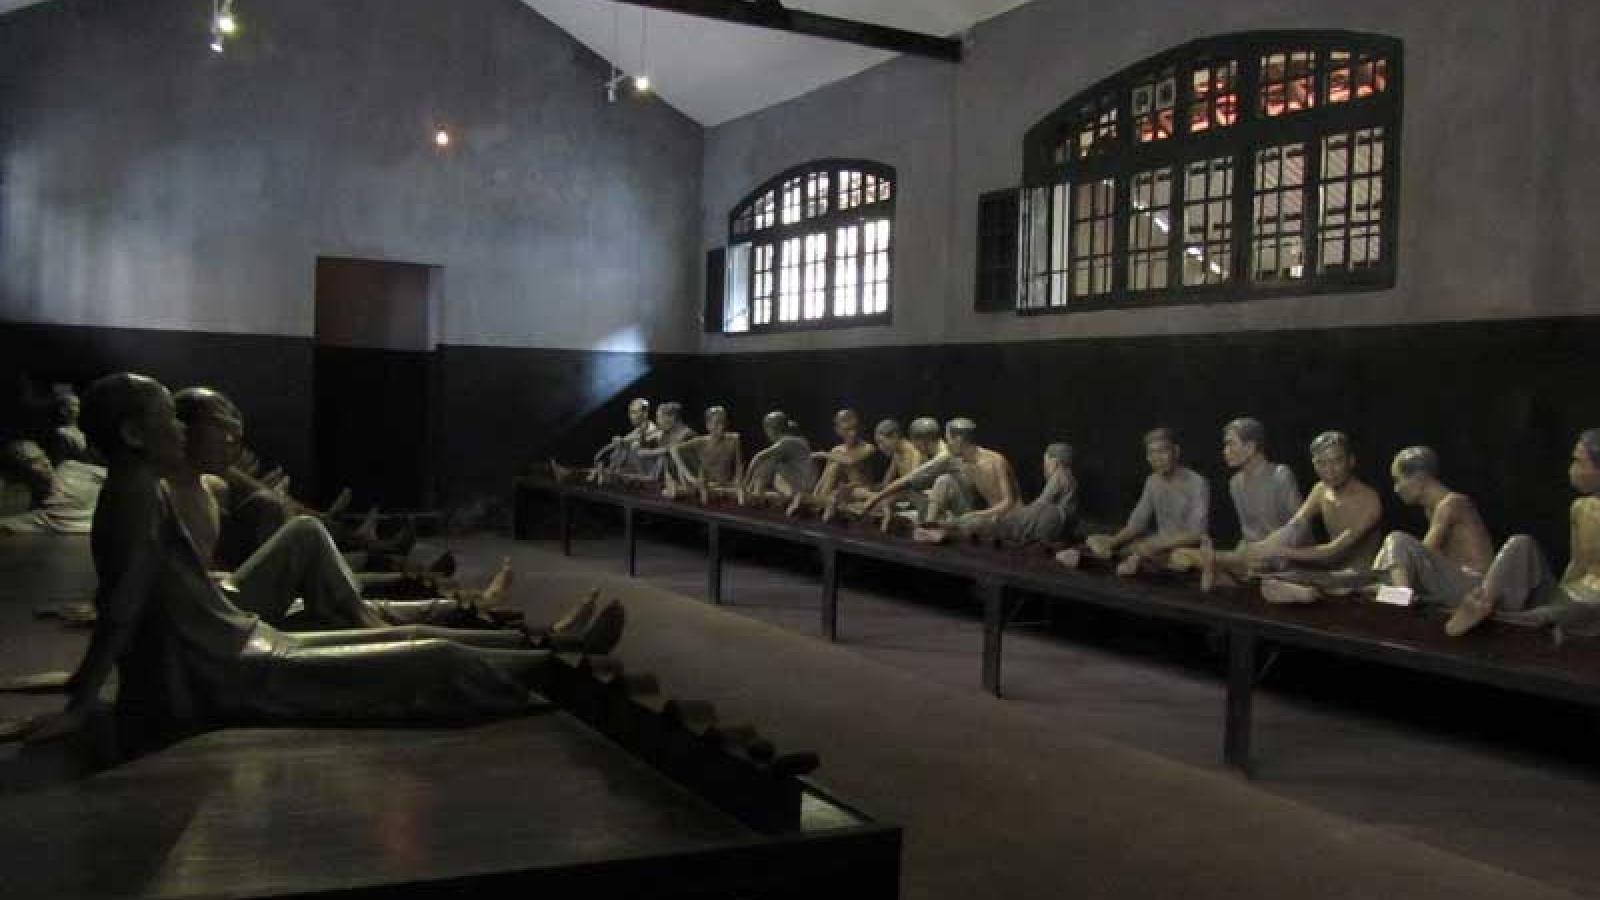 Hoa Lo Prison among leading historic prisons worldwide